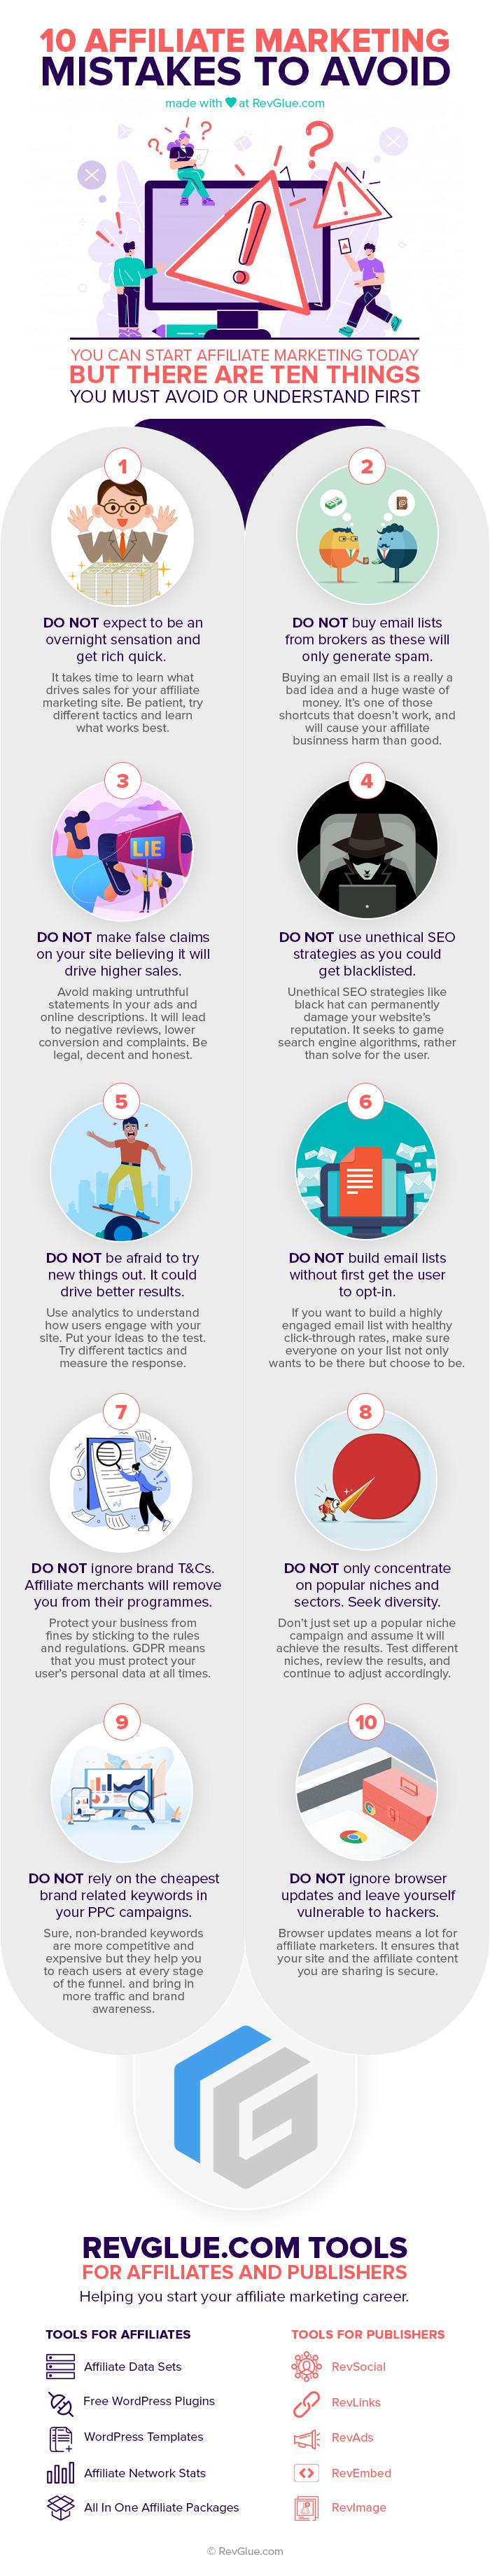 10 affiliate marketing mistakes to avoid inforgraphic.